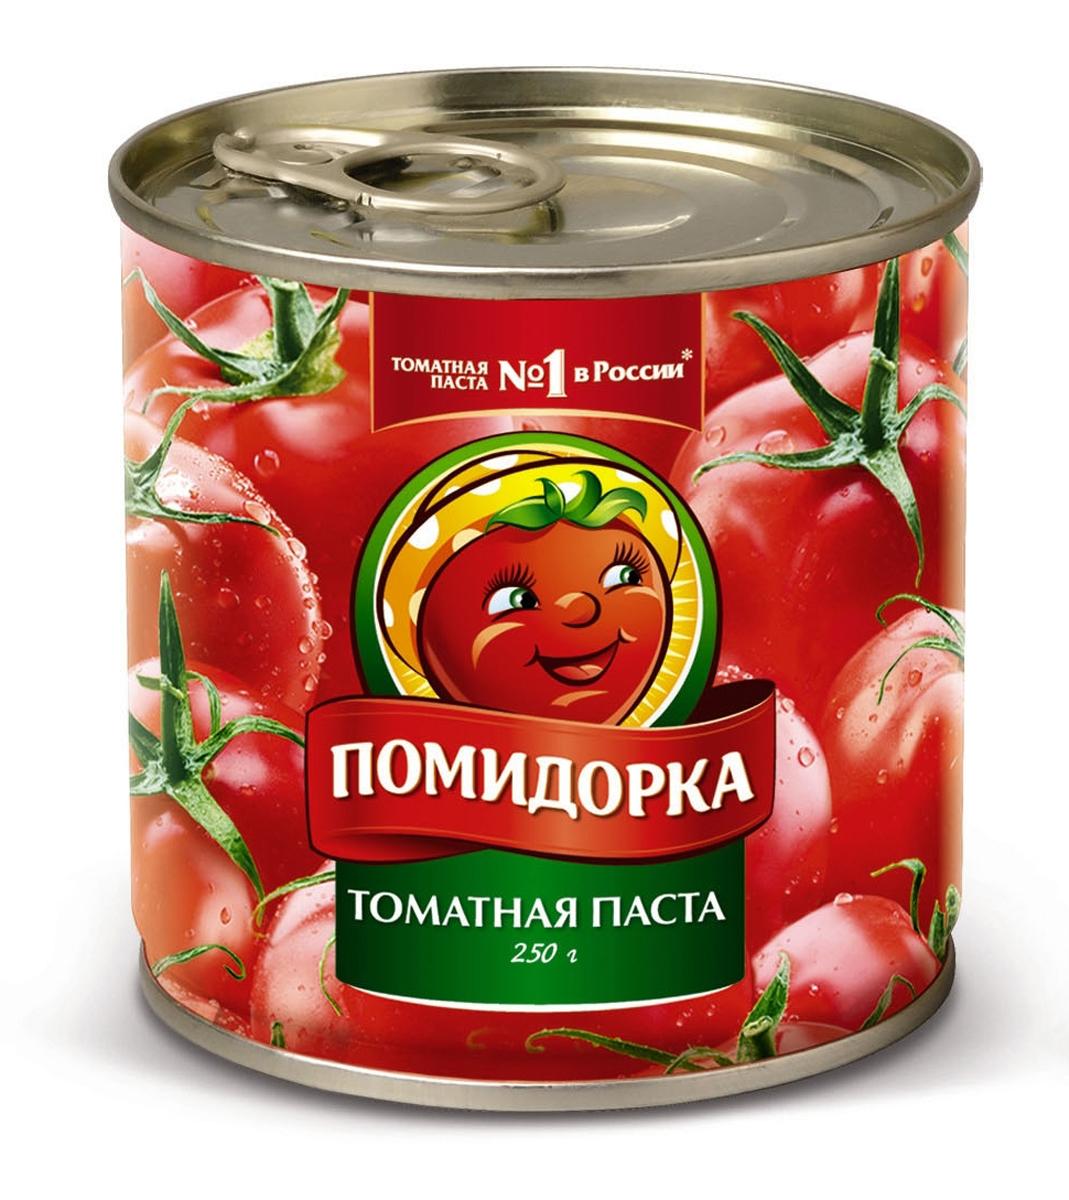 Помидорка Томатная паста, 250 г тони моли томатная